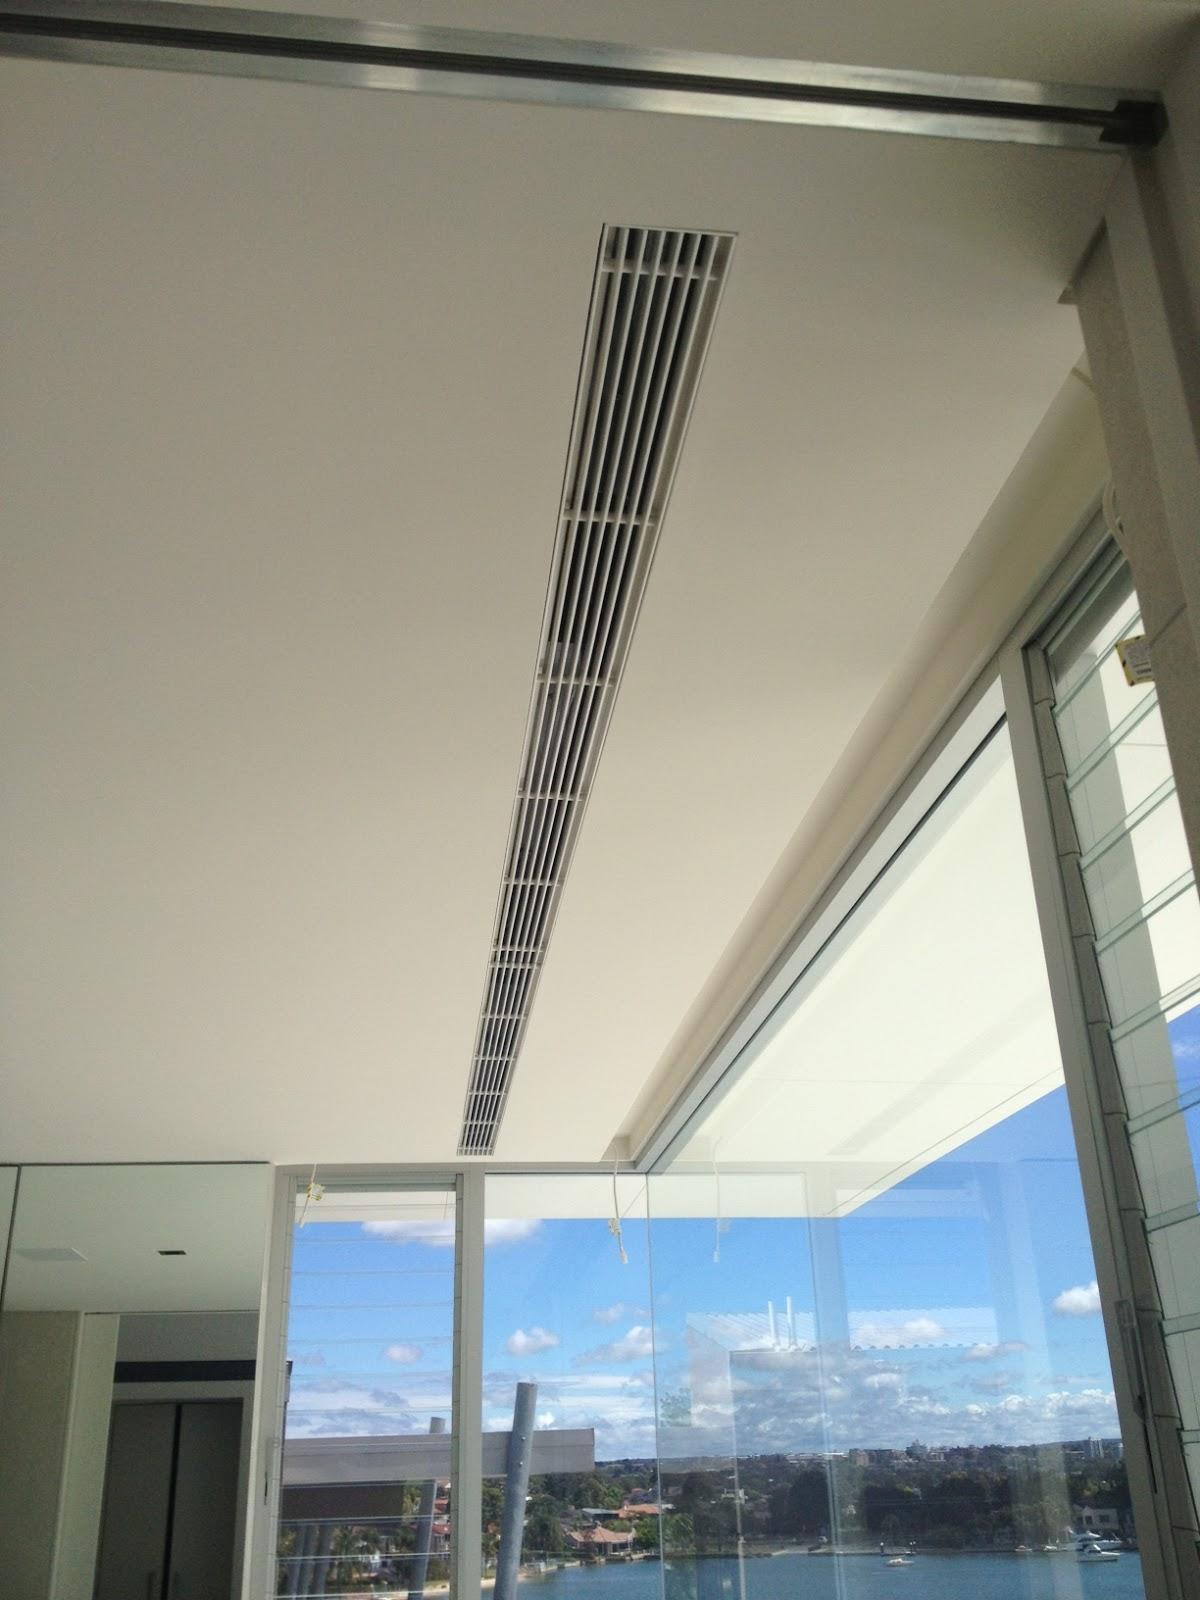 Linear Bar Air : Flangeless linear bar grilles